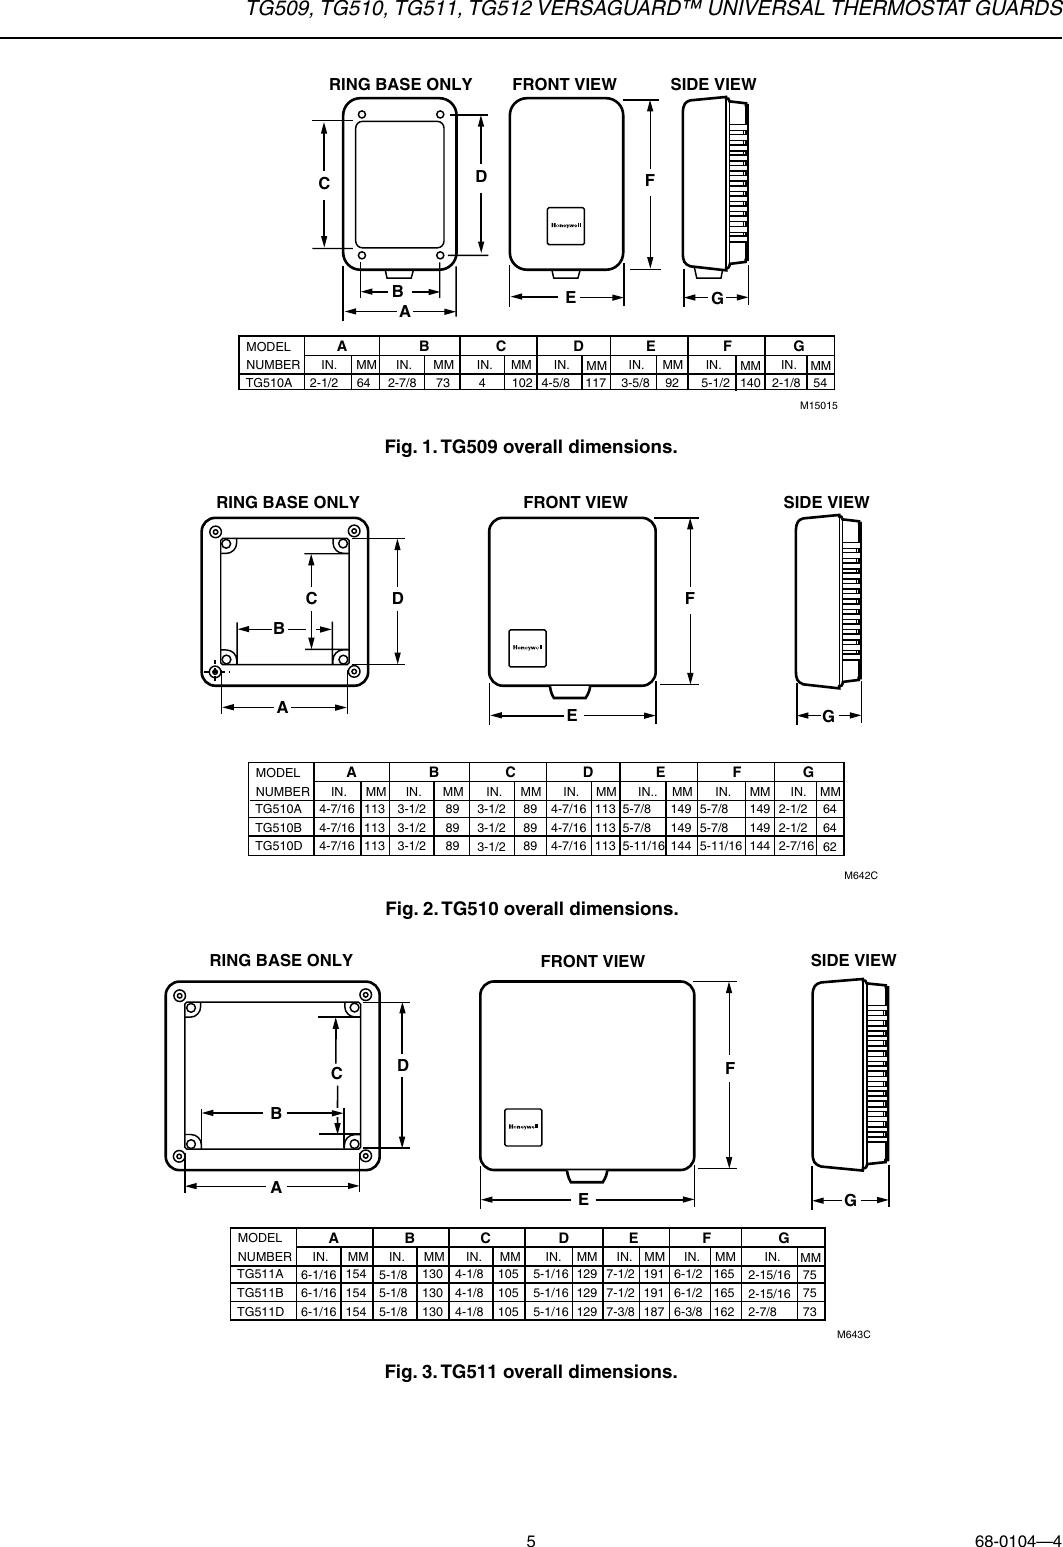 honeywell building controls division Building systems control (15935),  a division of novar controls corporation:  building systems controls building system controls hvac.